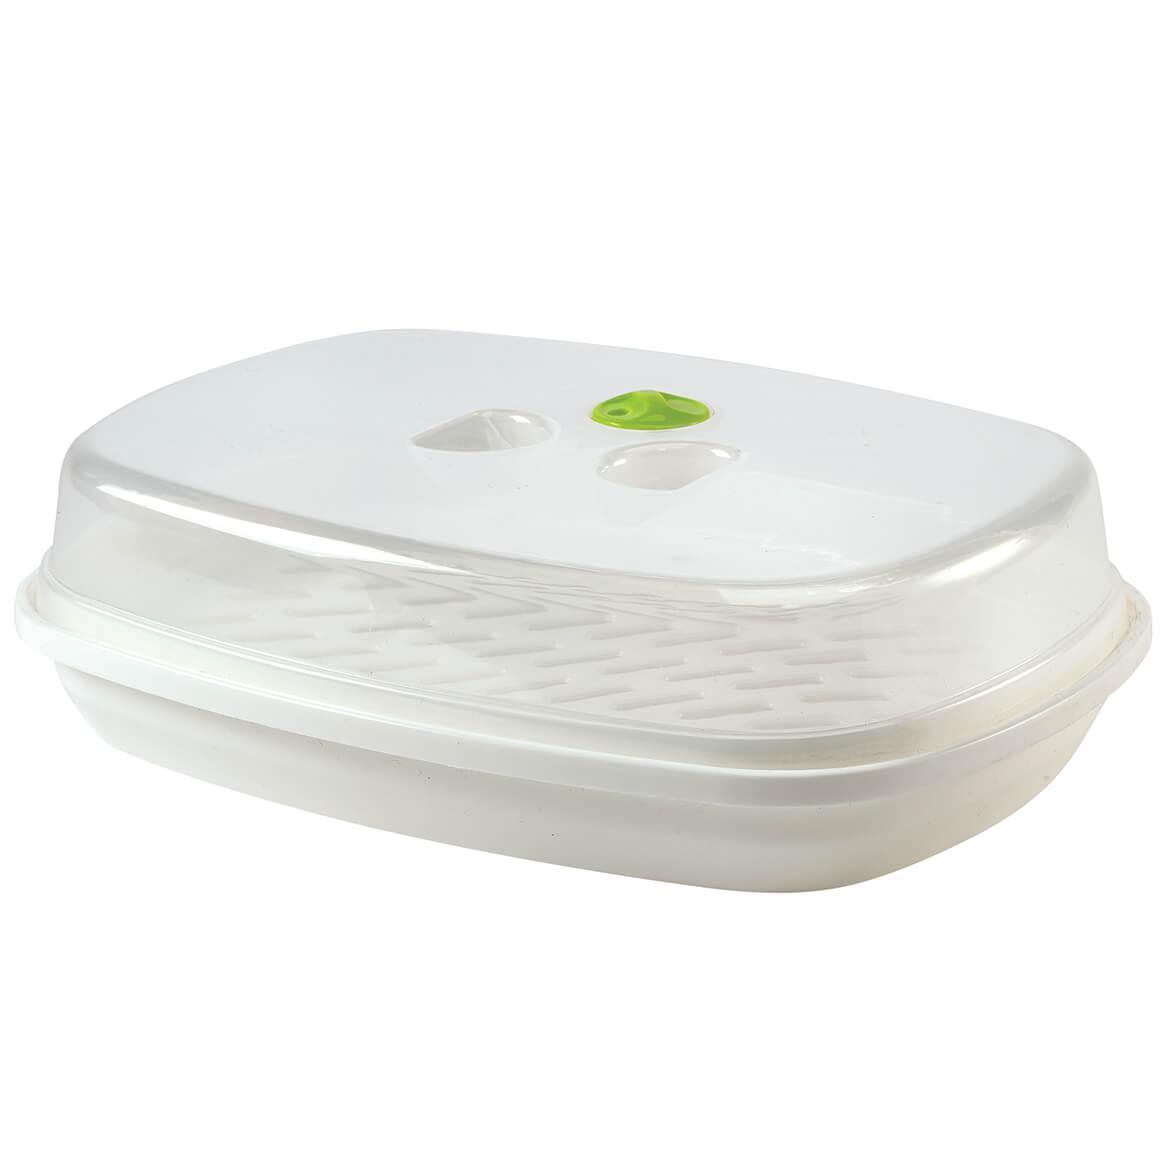 3-Piece All-Purpose Microwave Steamer-370740